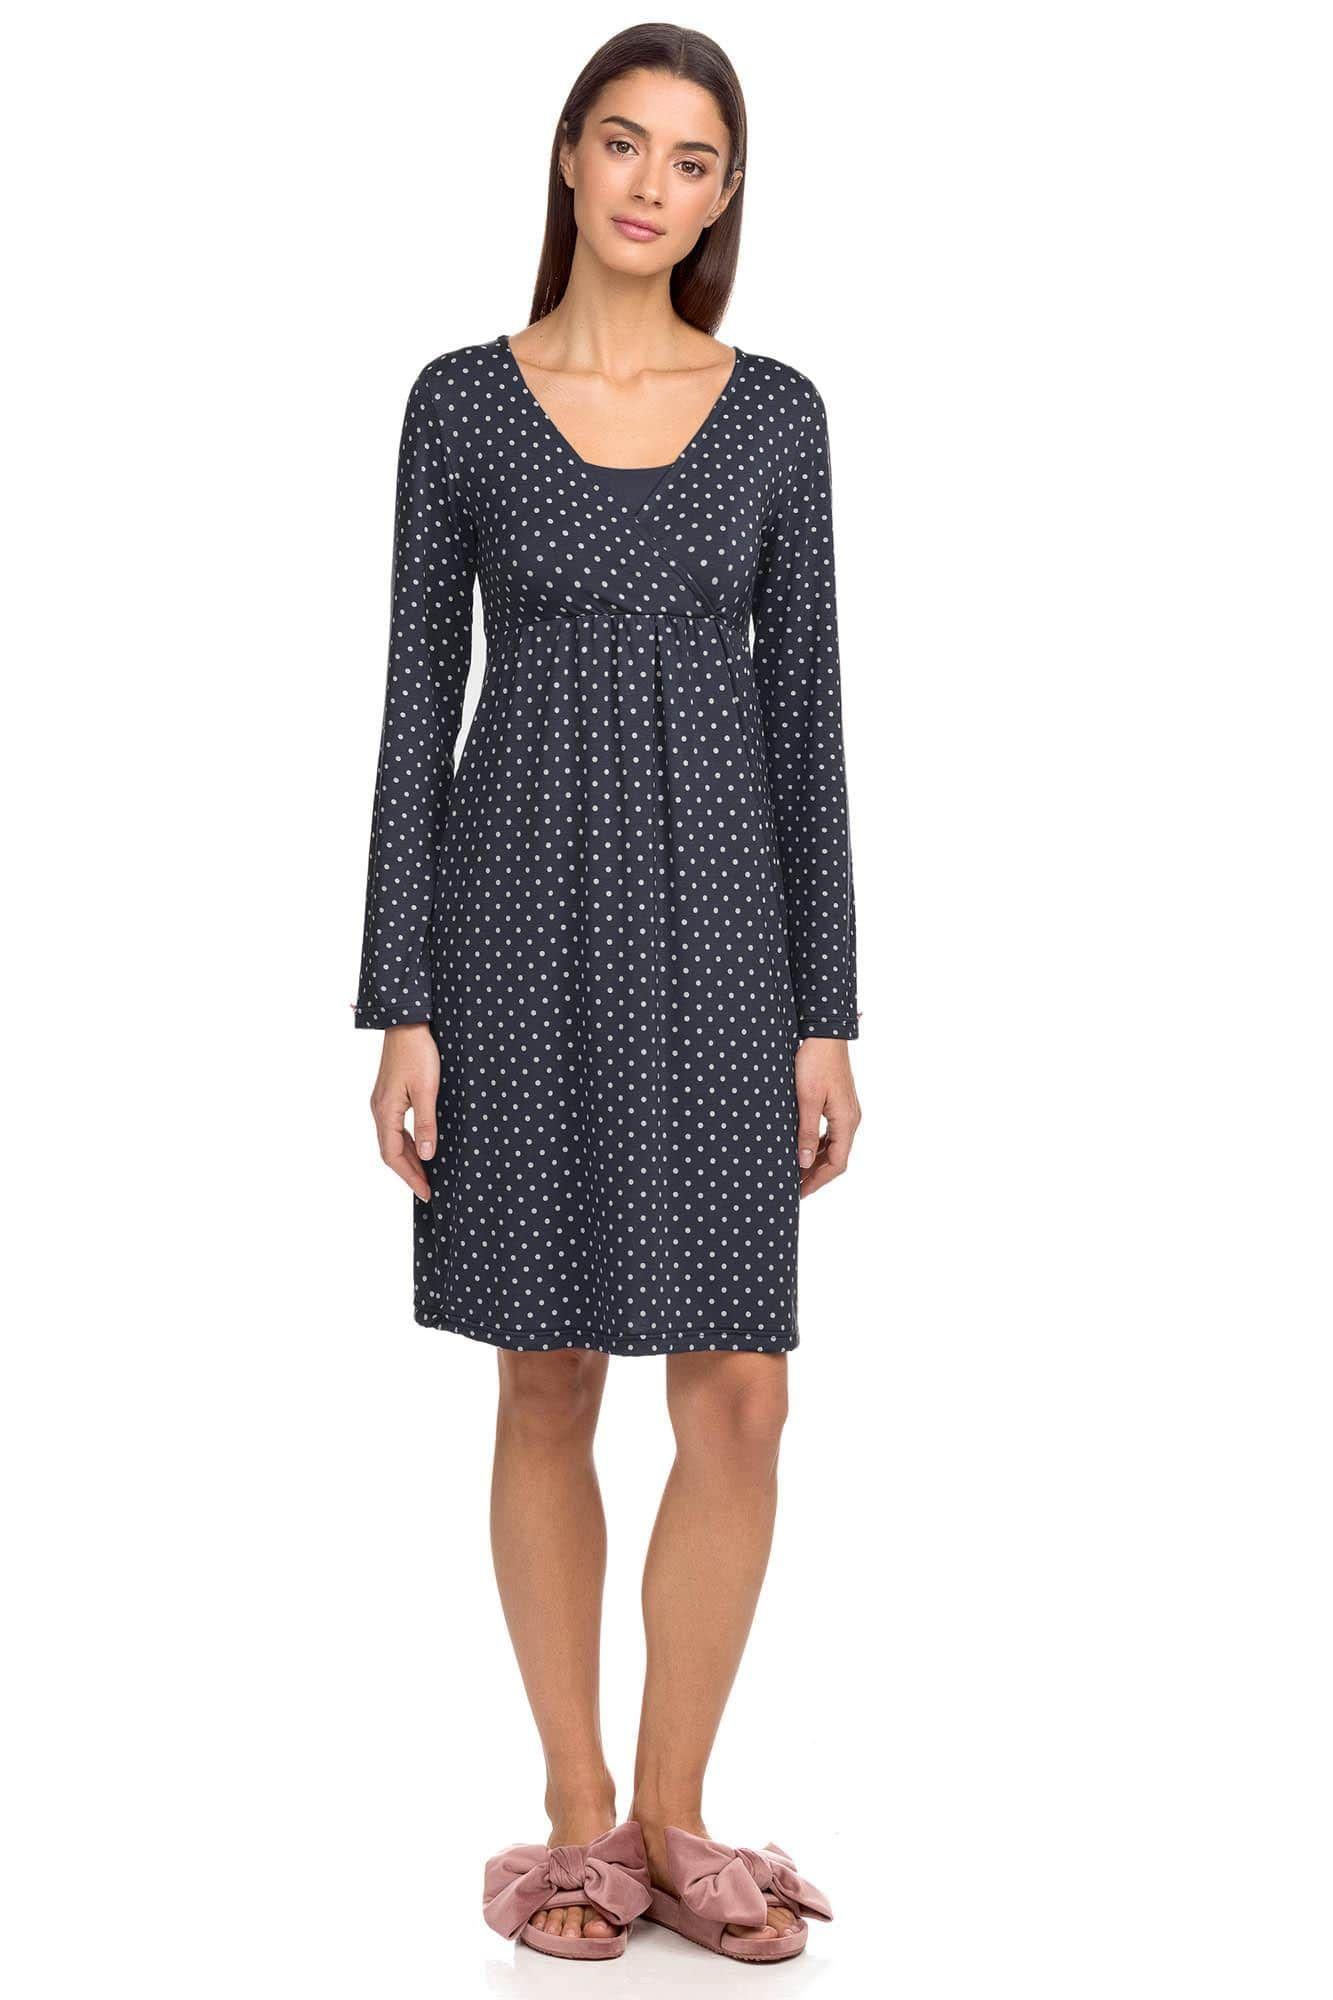 Polka dot Maternity Nightgown